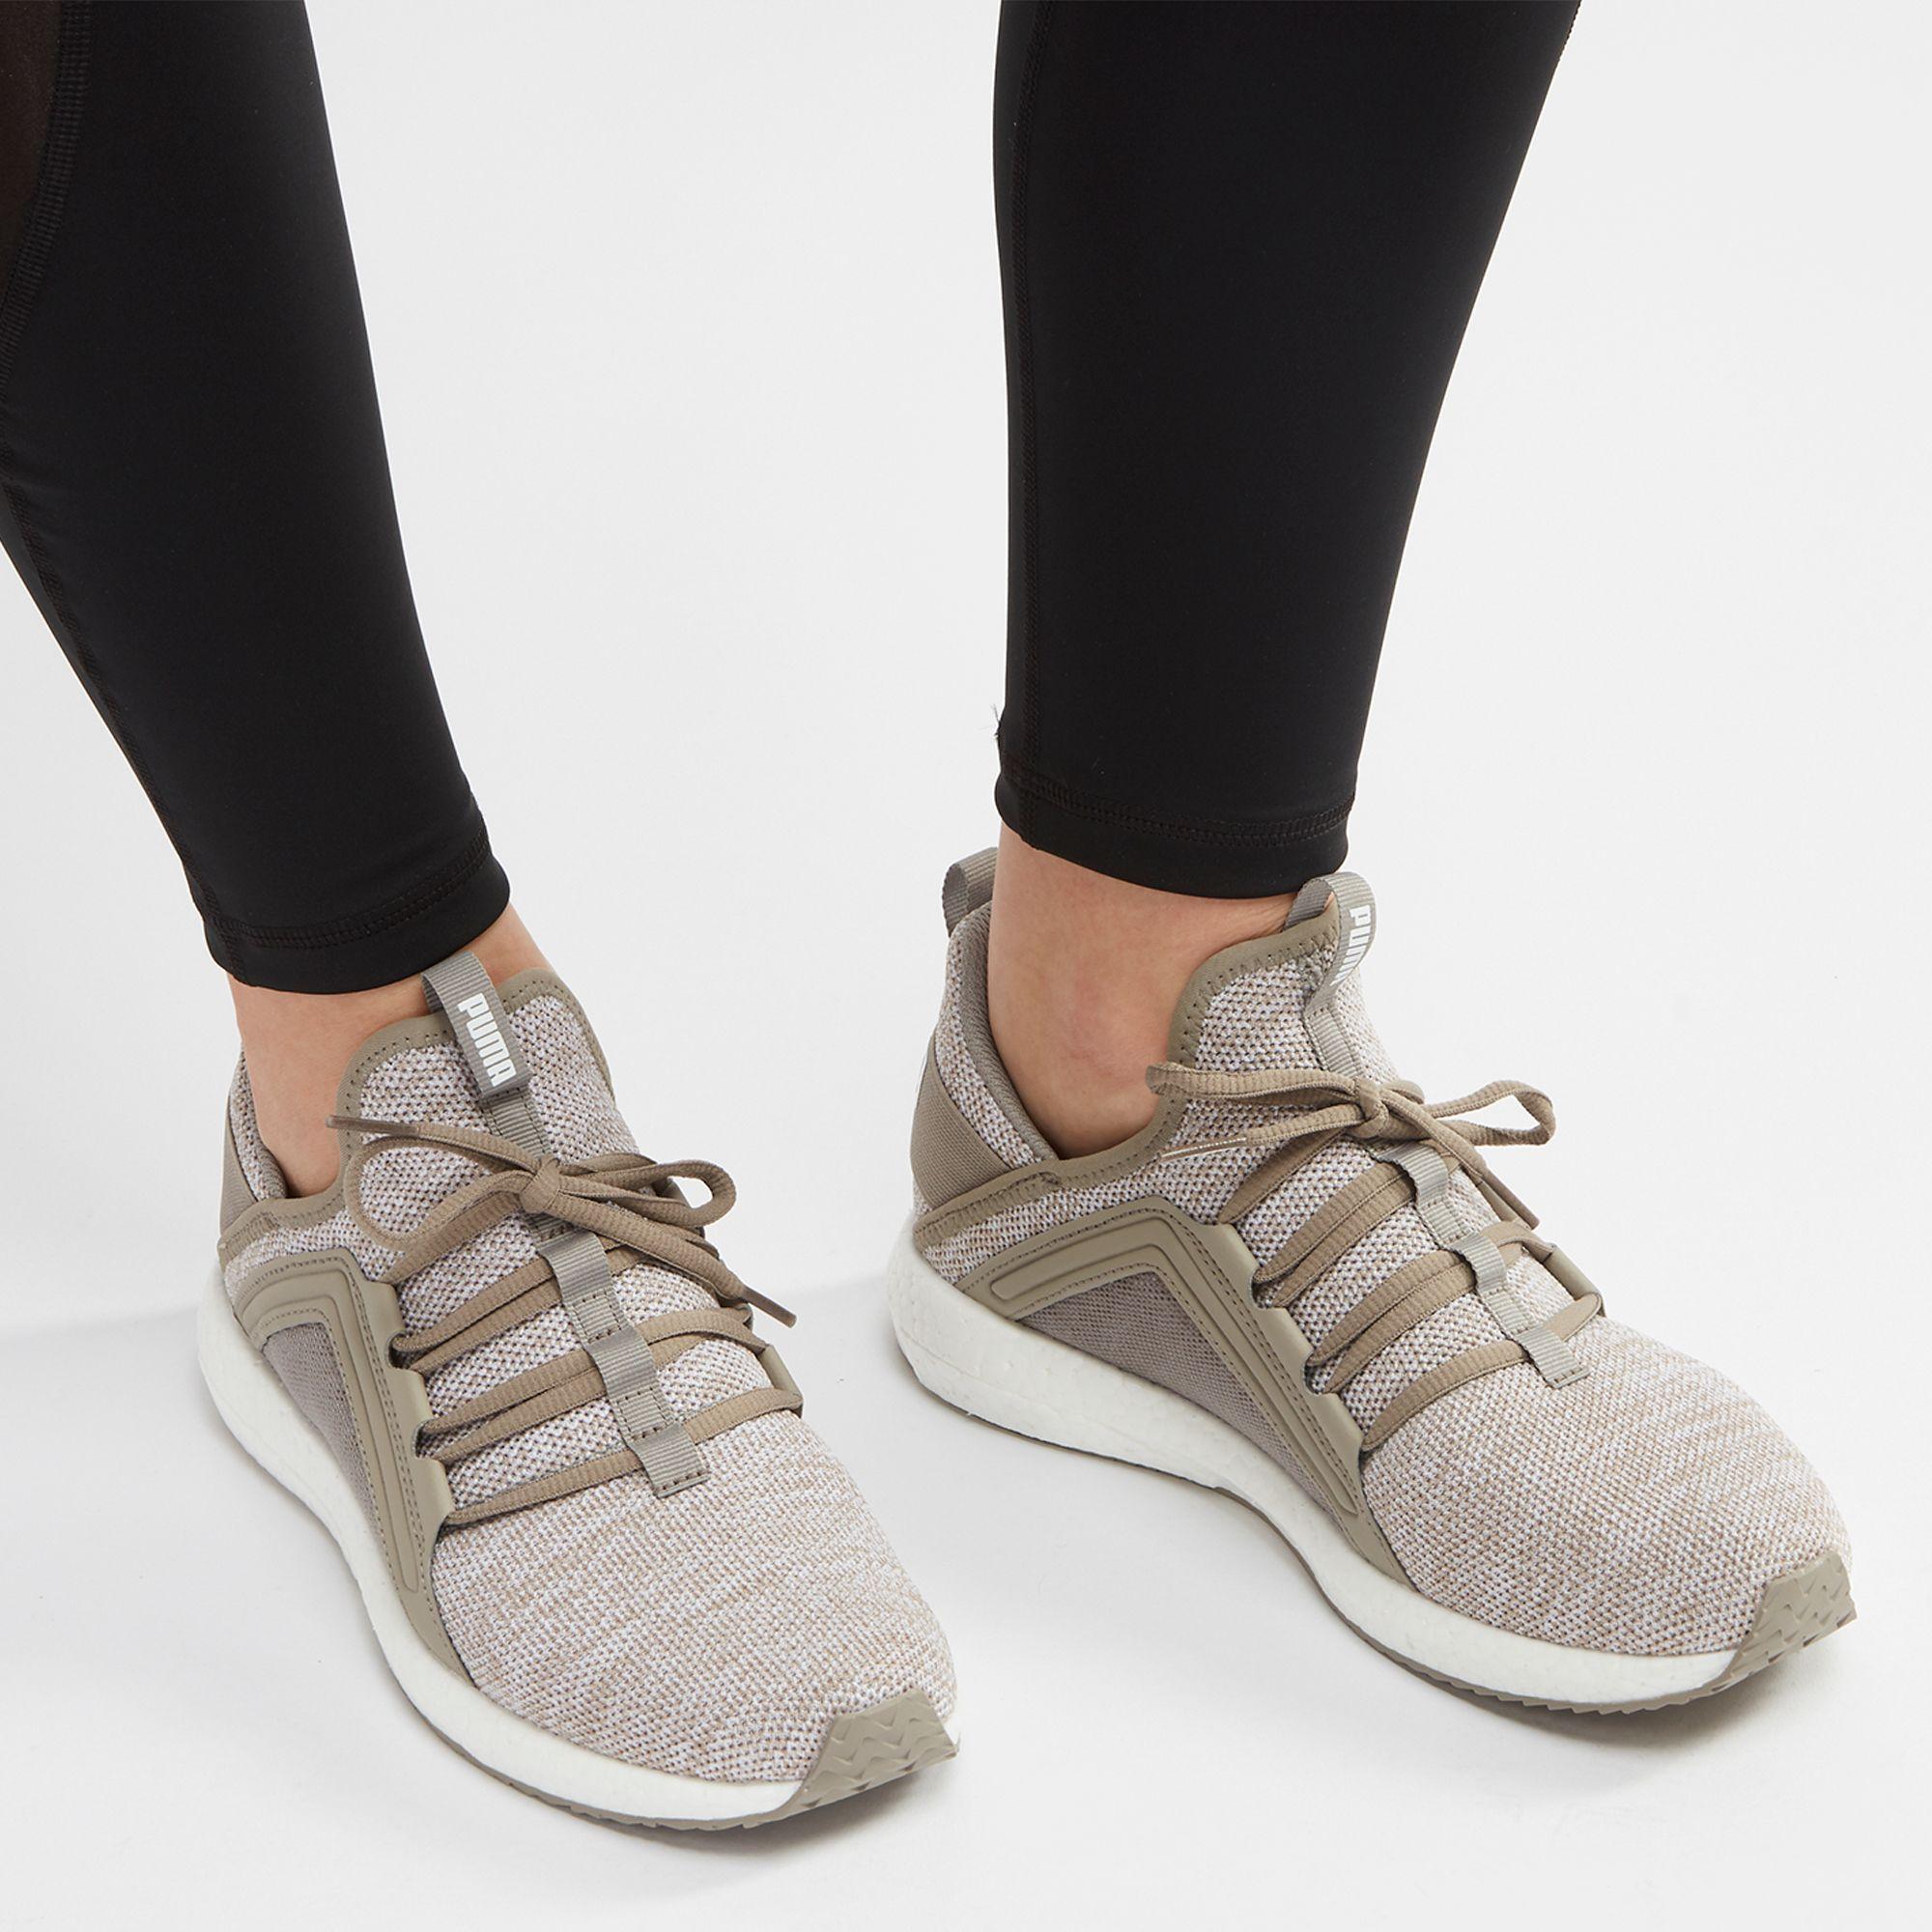 puma women's mega nrgy running shoes